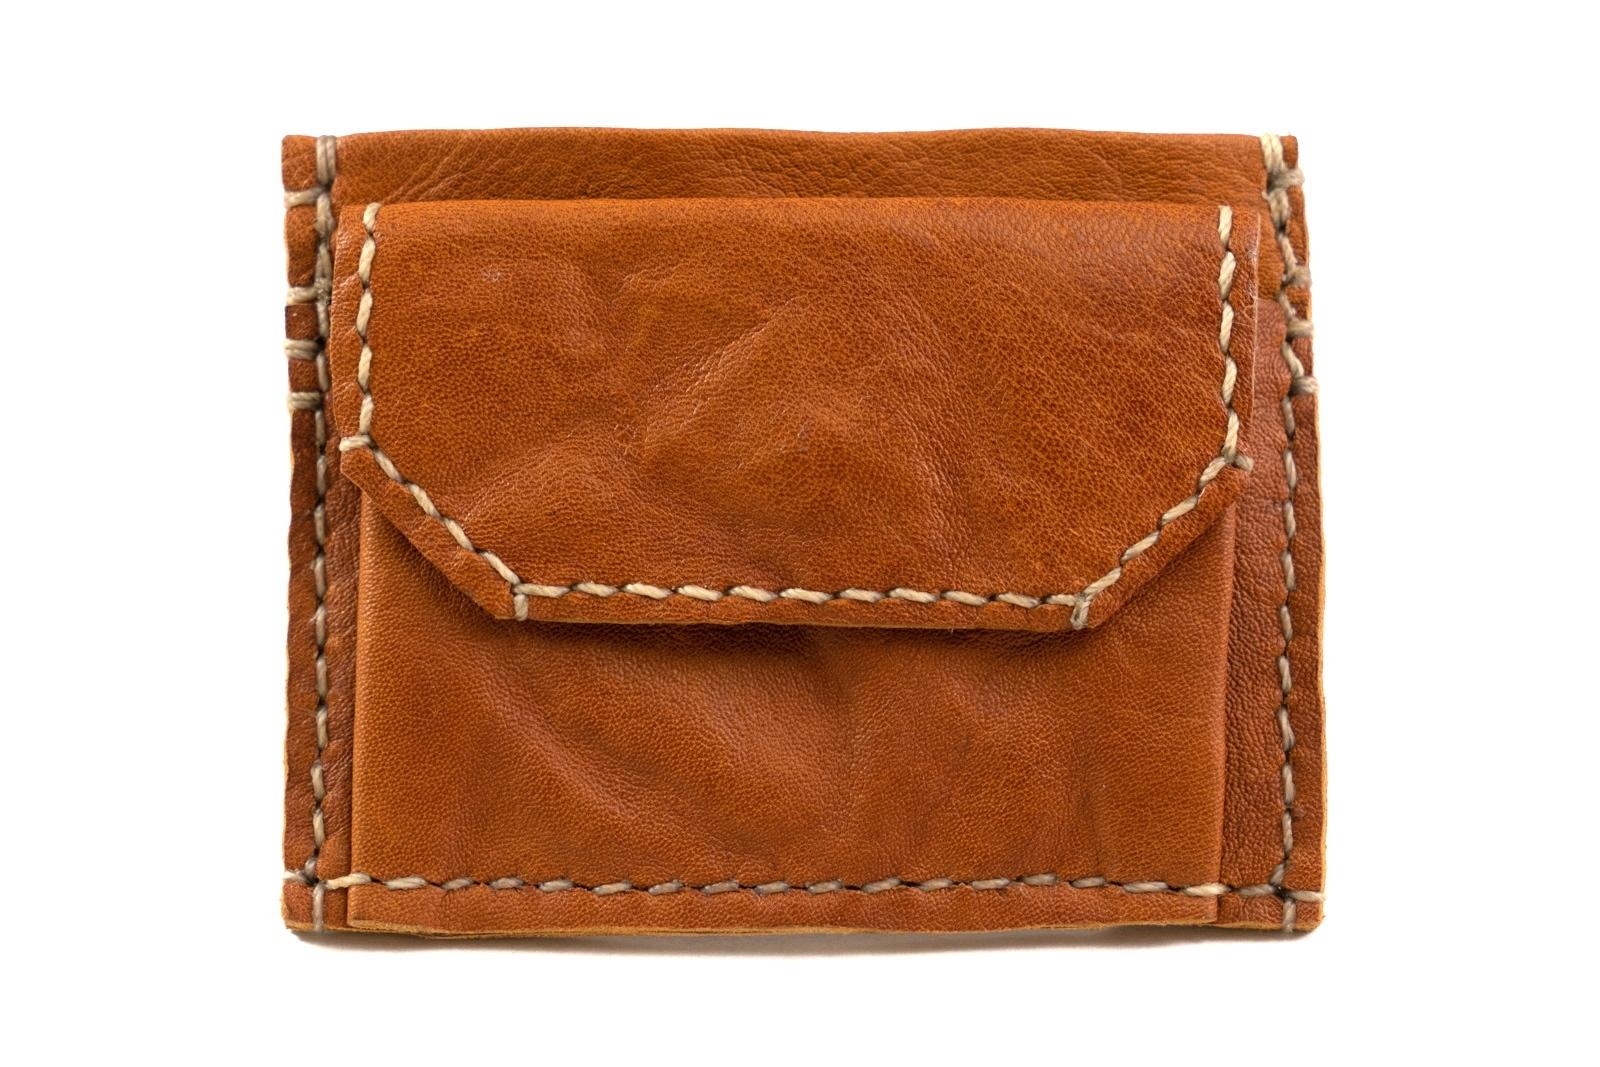 Vigo Cw Kangaroo Leather Compact Wallet